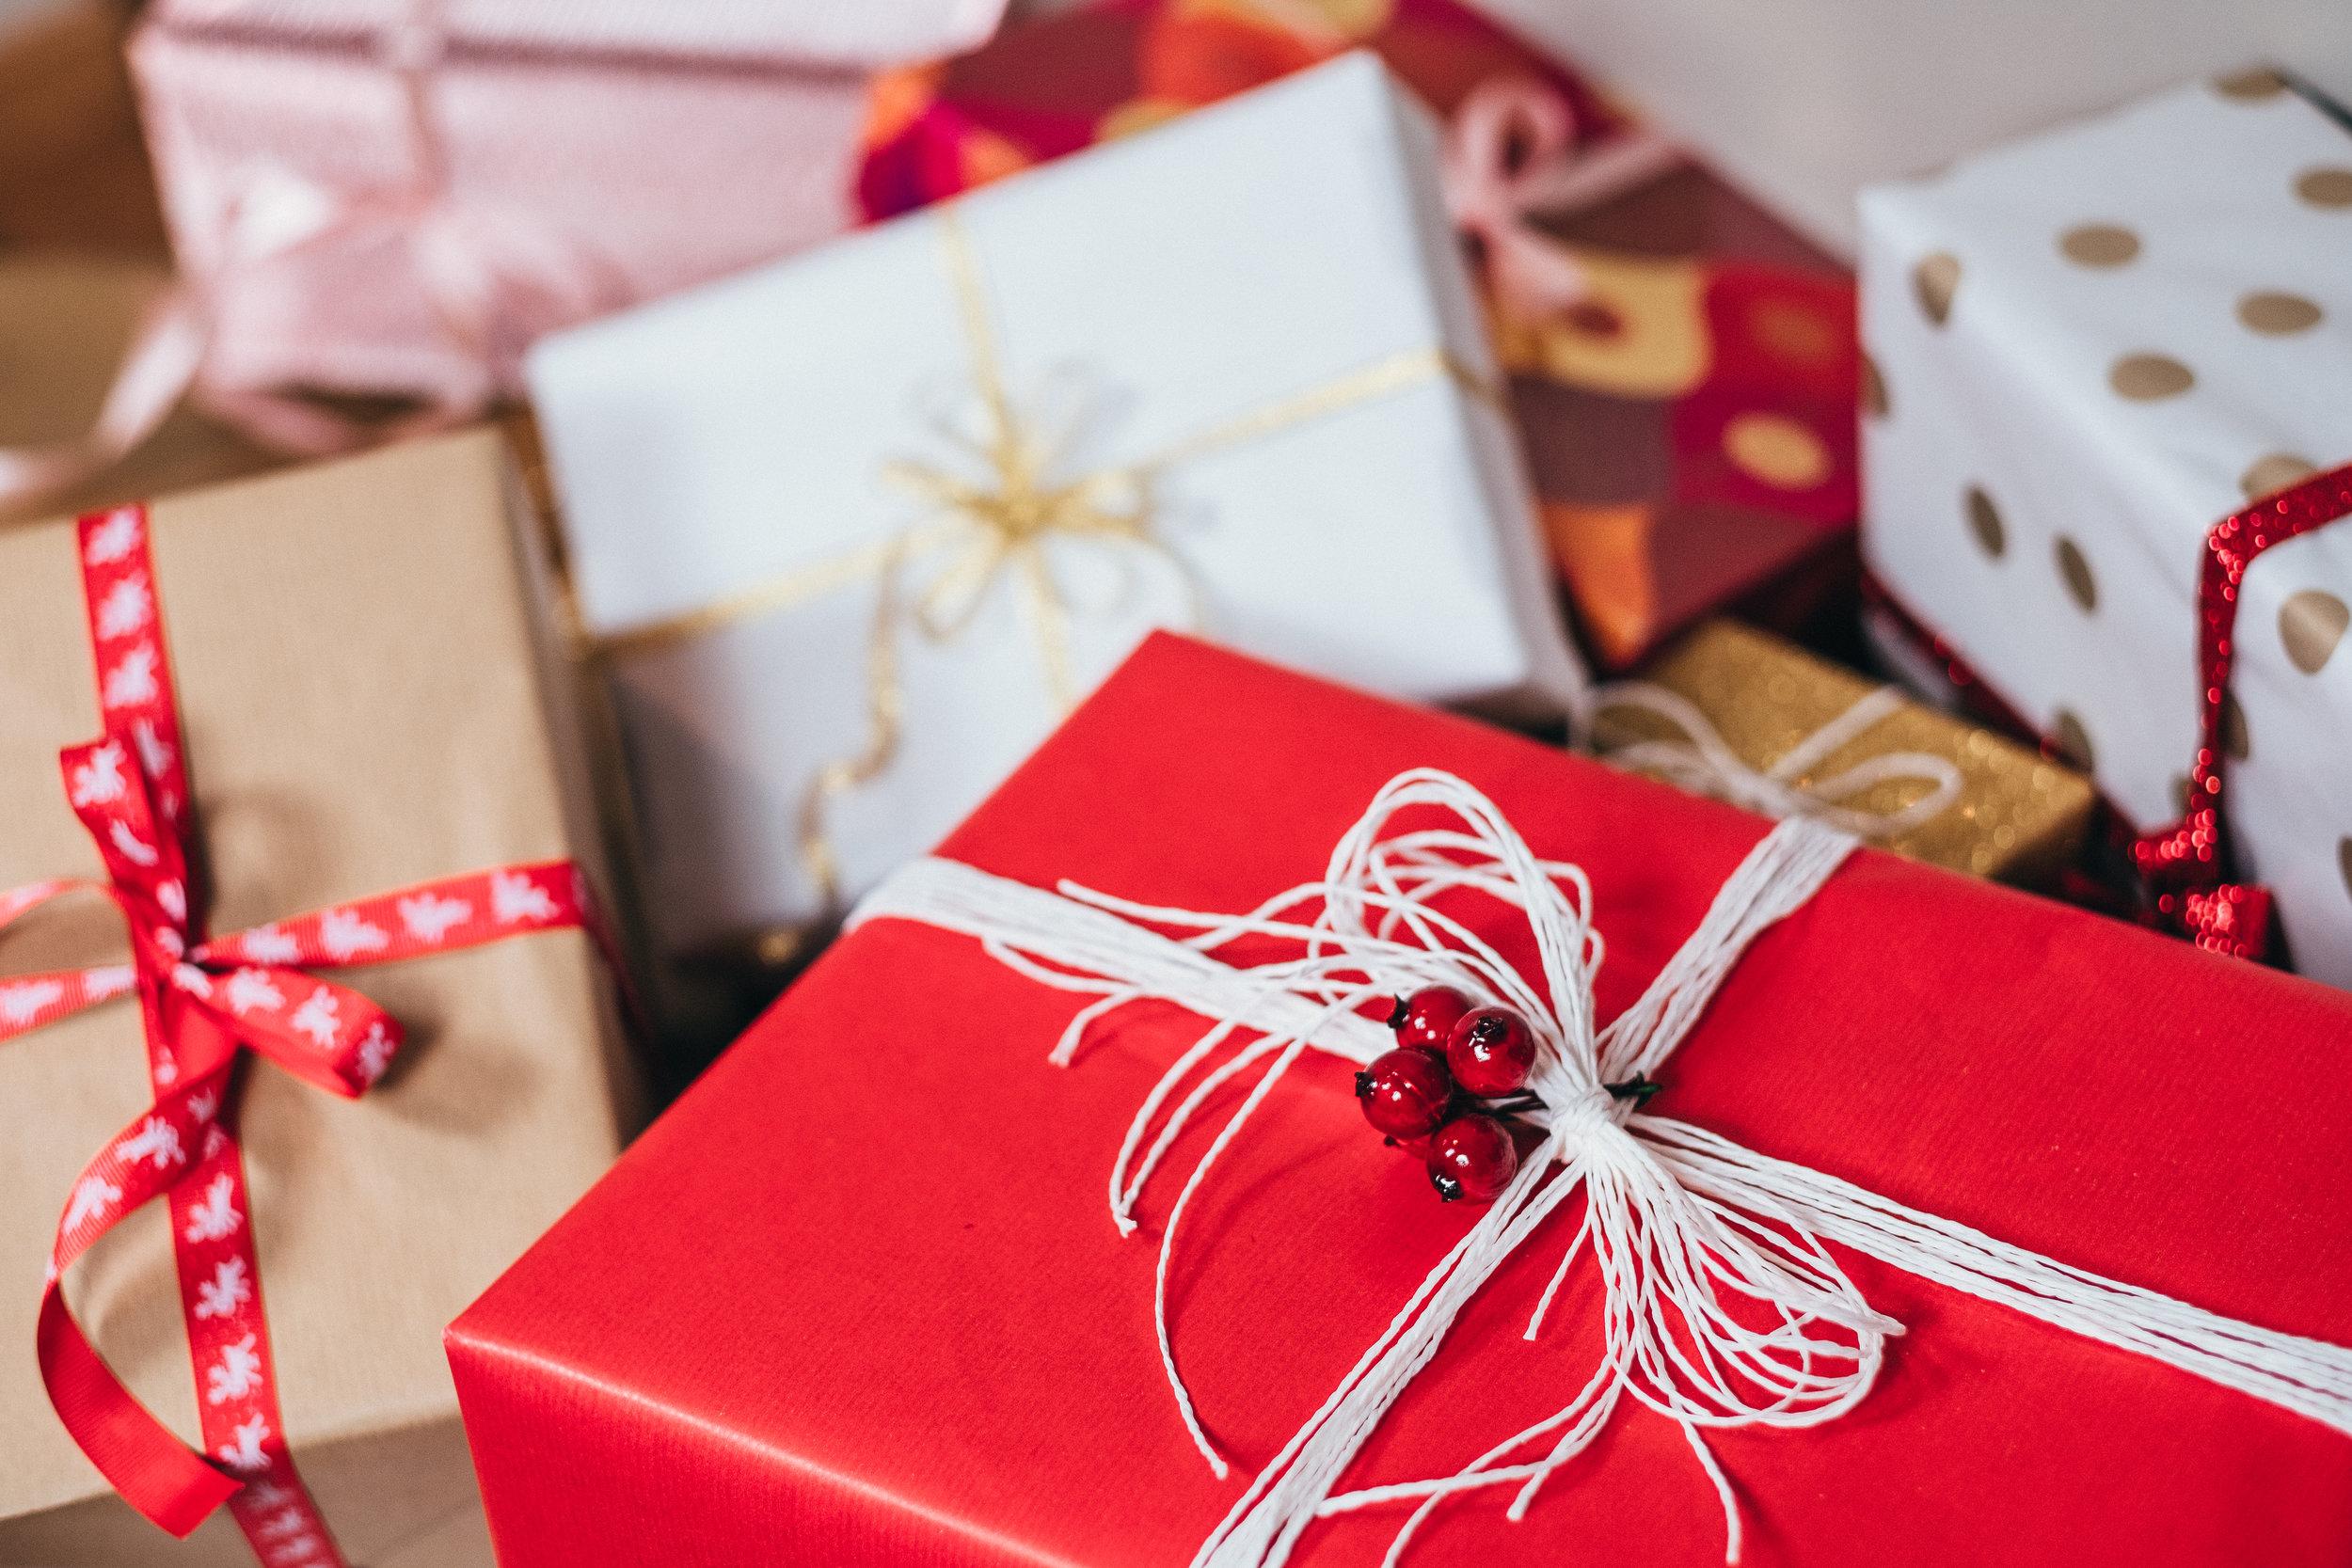 gifts for men | men gift ideas | boyfriend gift ideas | gift ideas for your boyfriend | gift ideas for your dad | gift ideas for your brother | s'more happiness